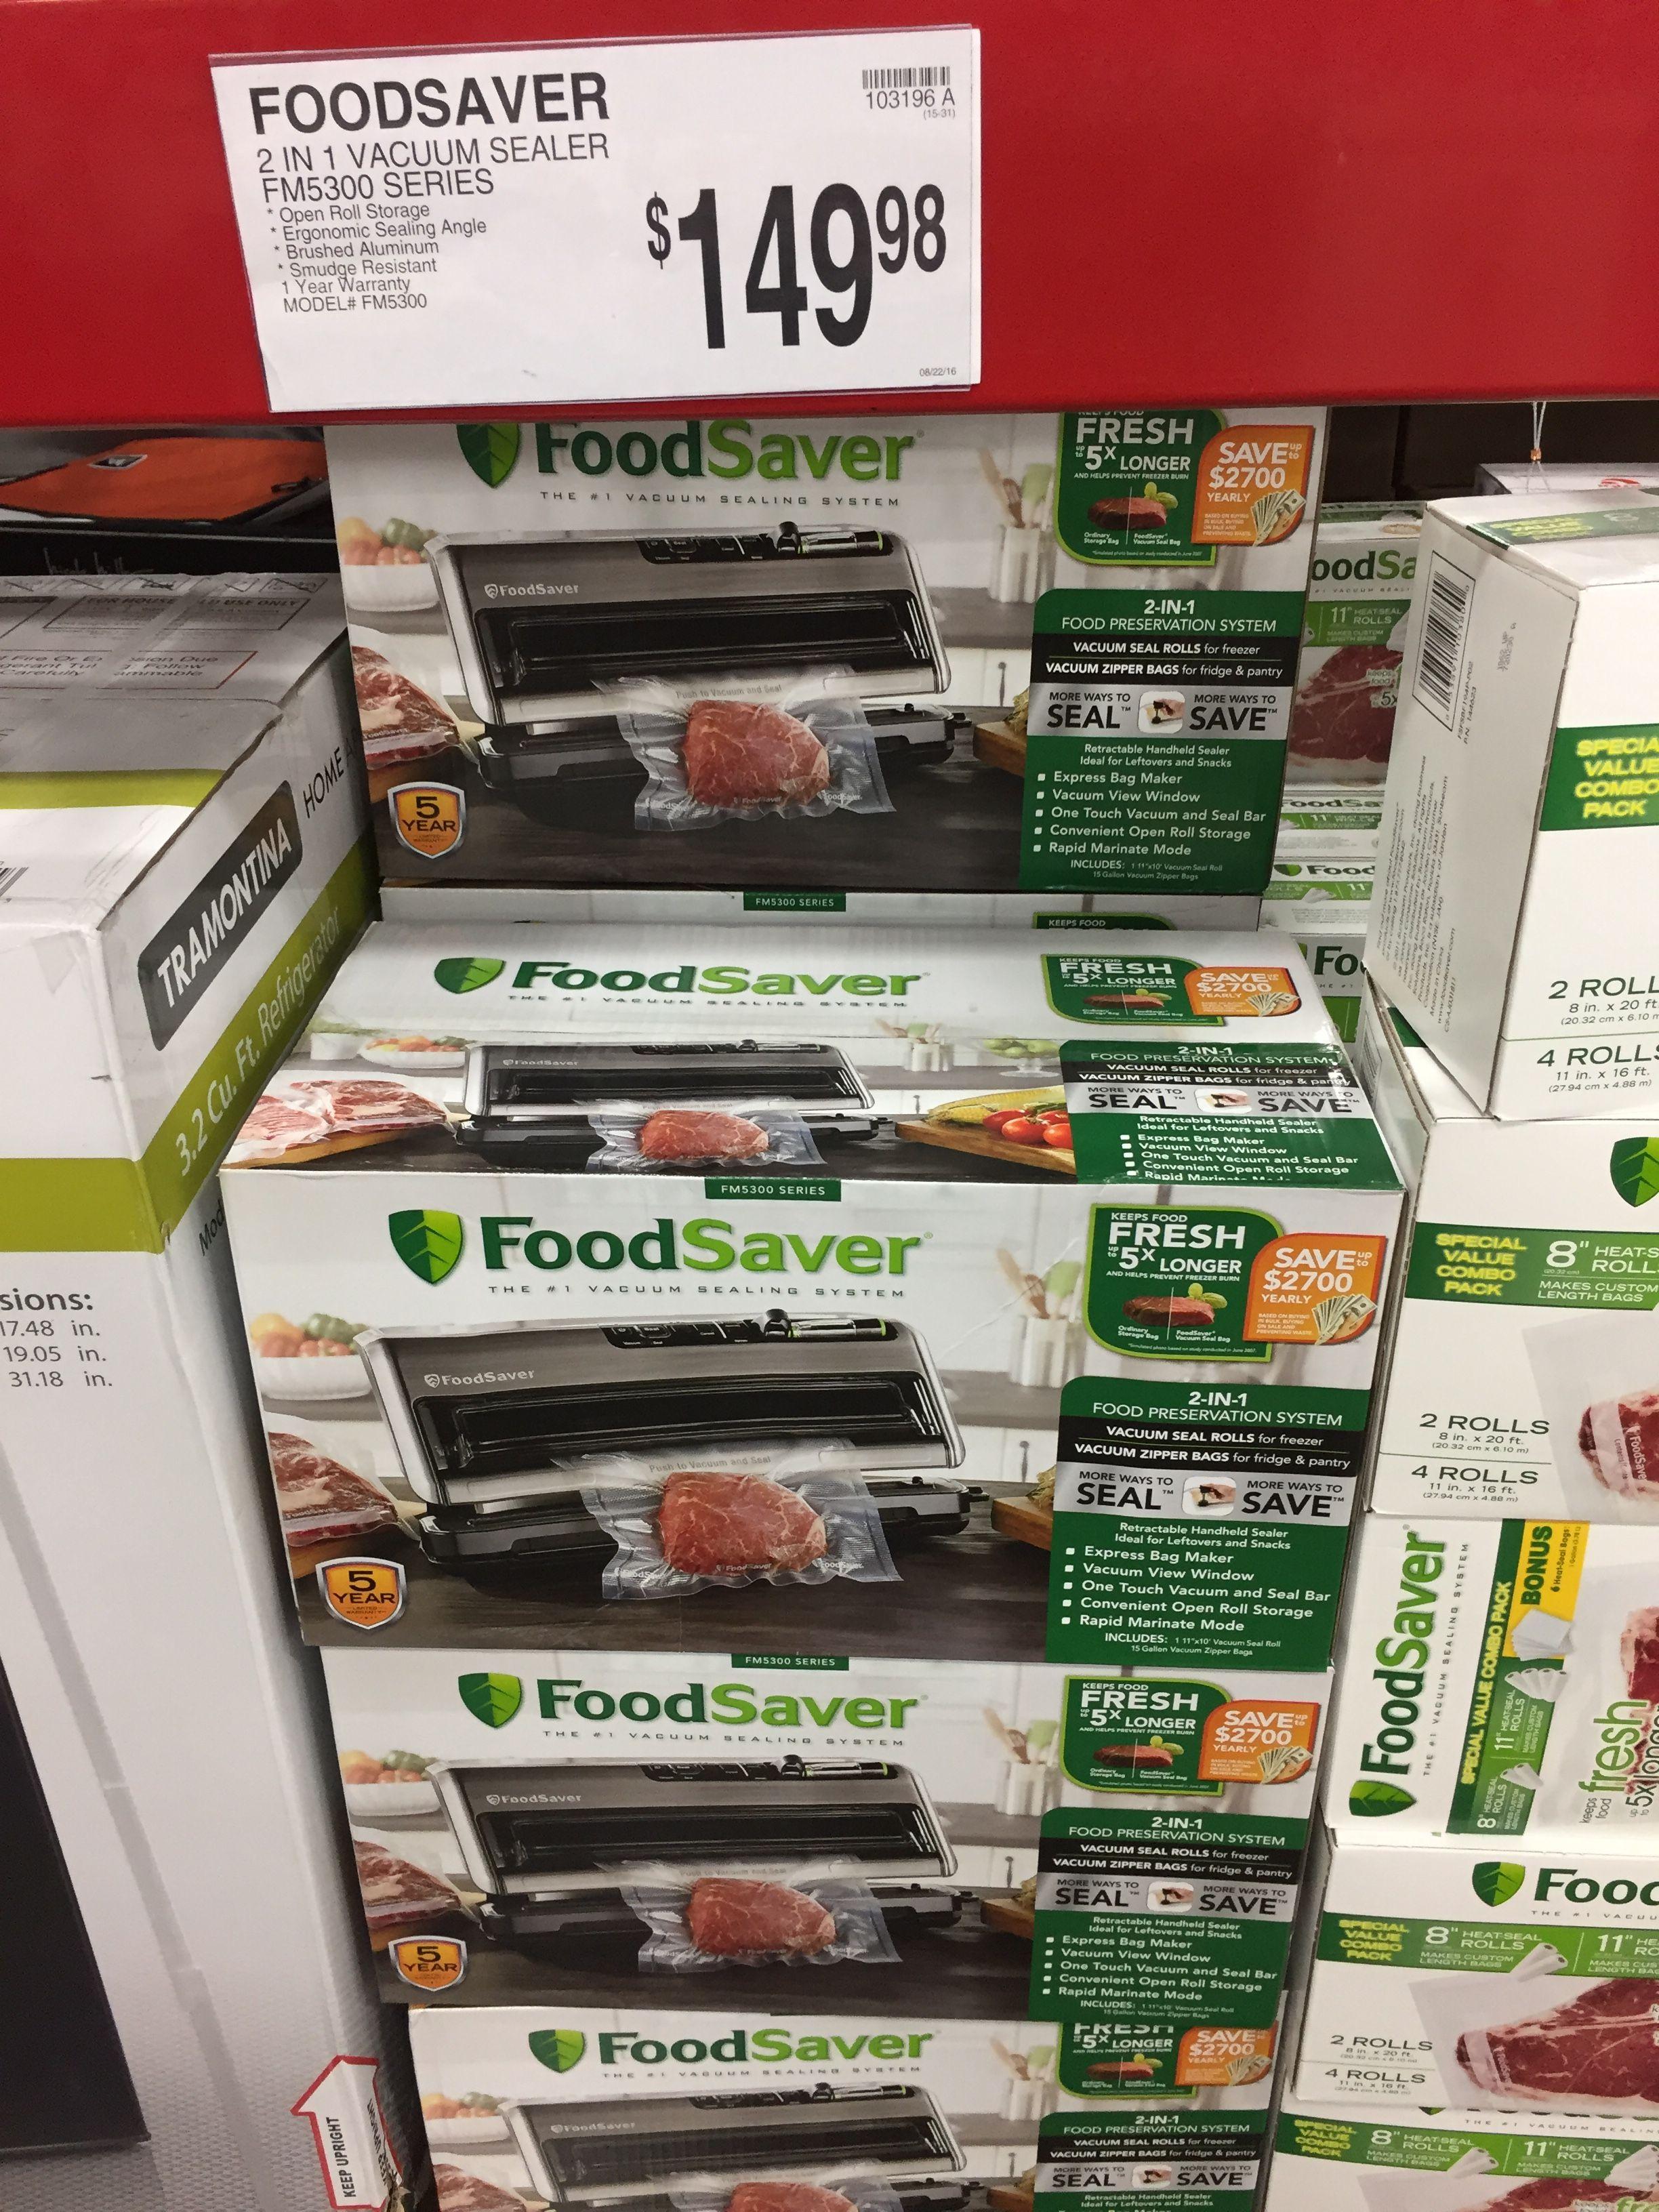 Food saver sams food saver food vacuum sealer